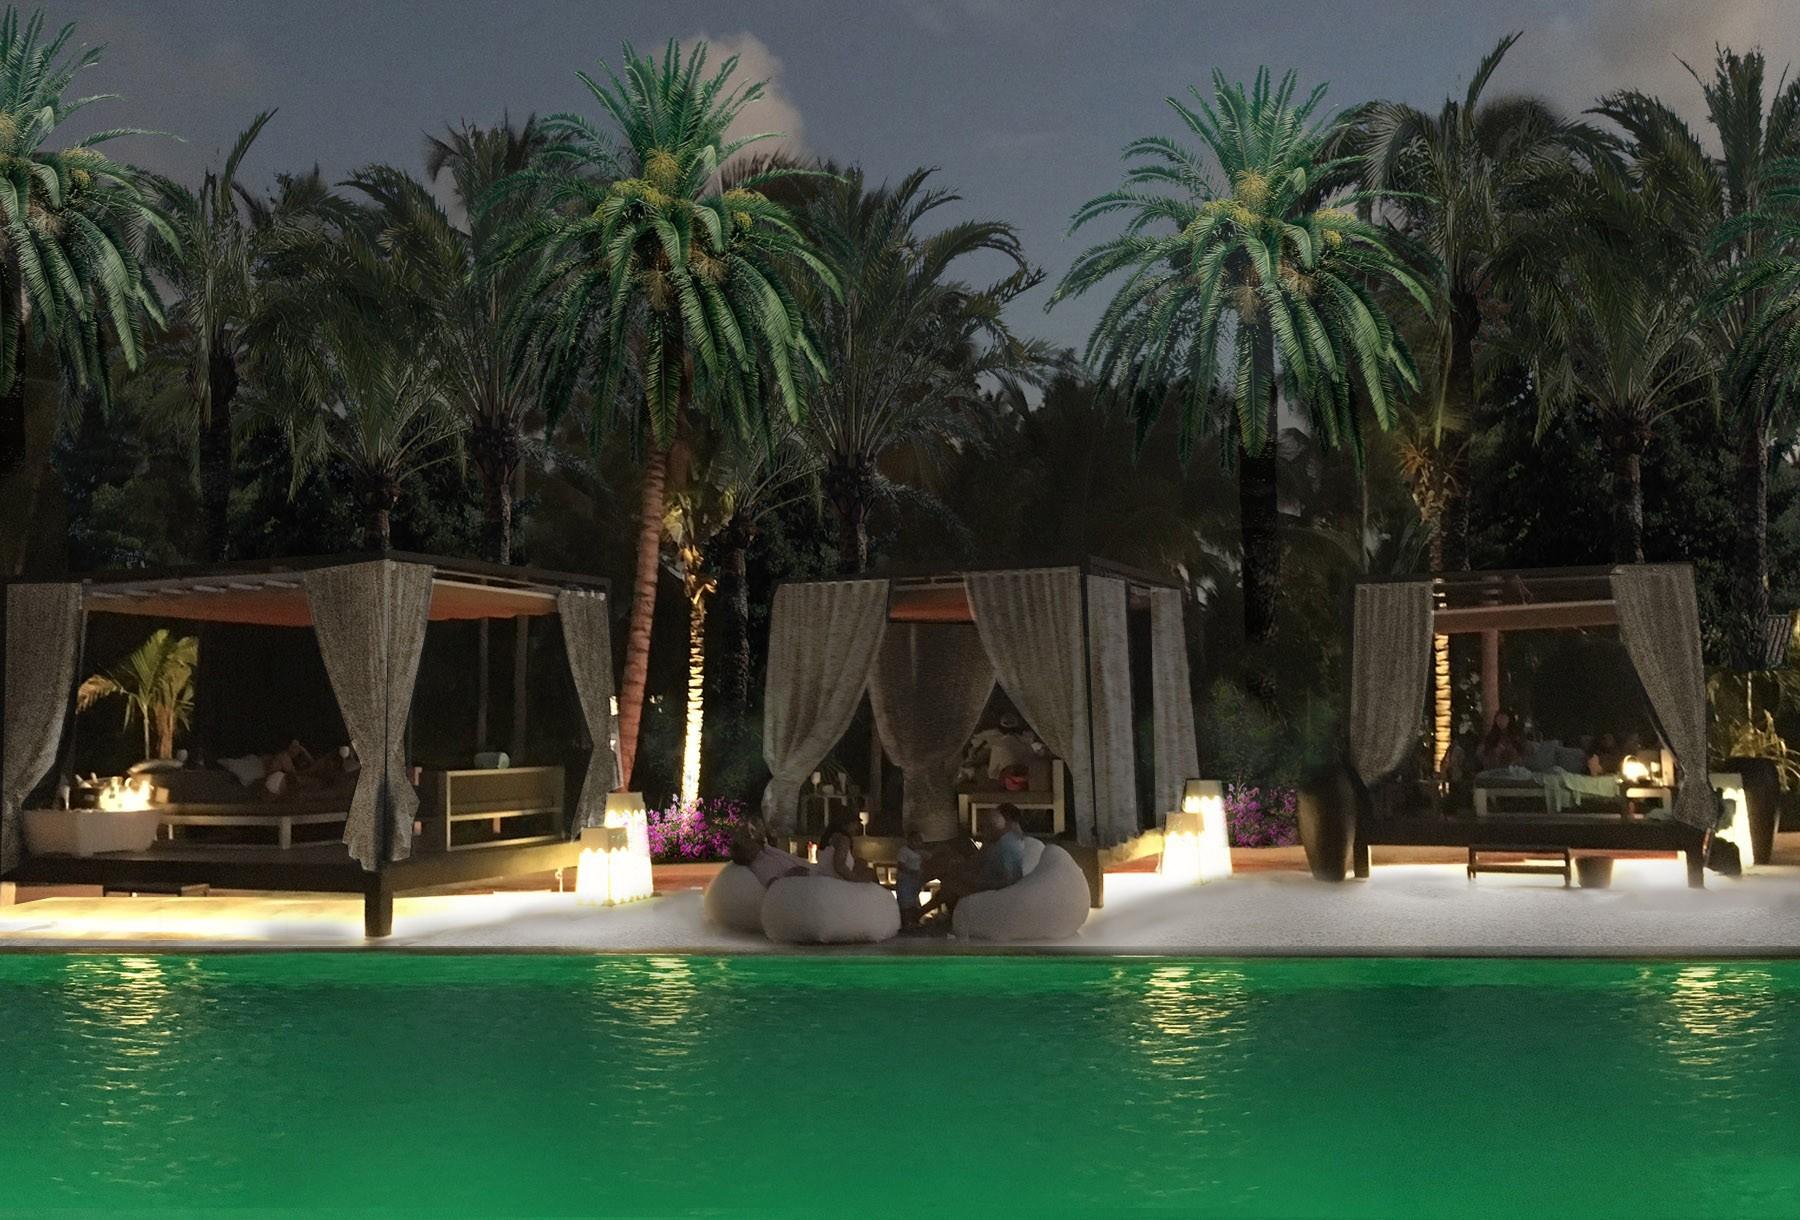 Dubai Dream - Tourist Residential Complexes